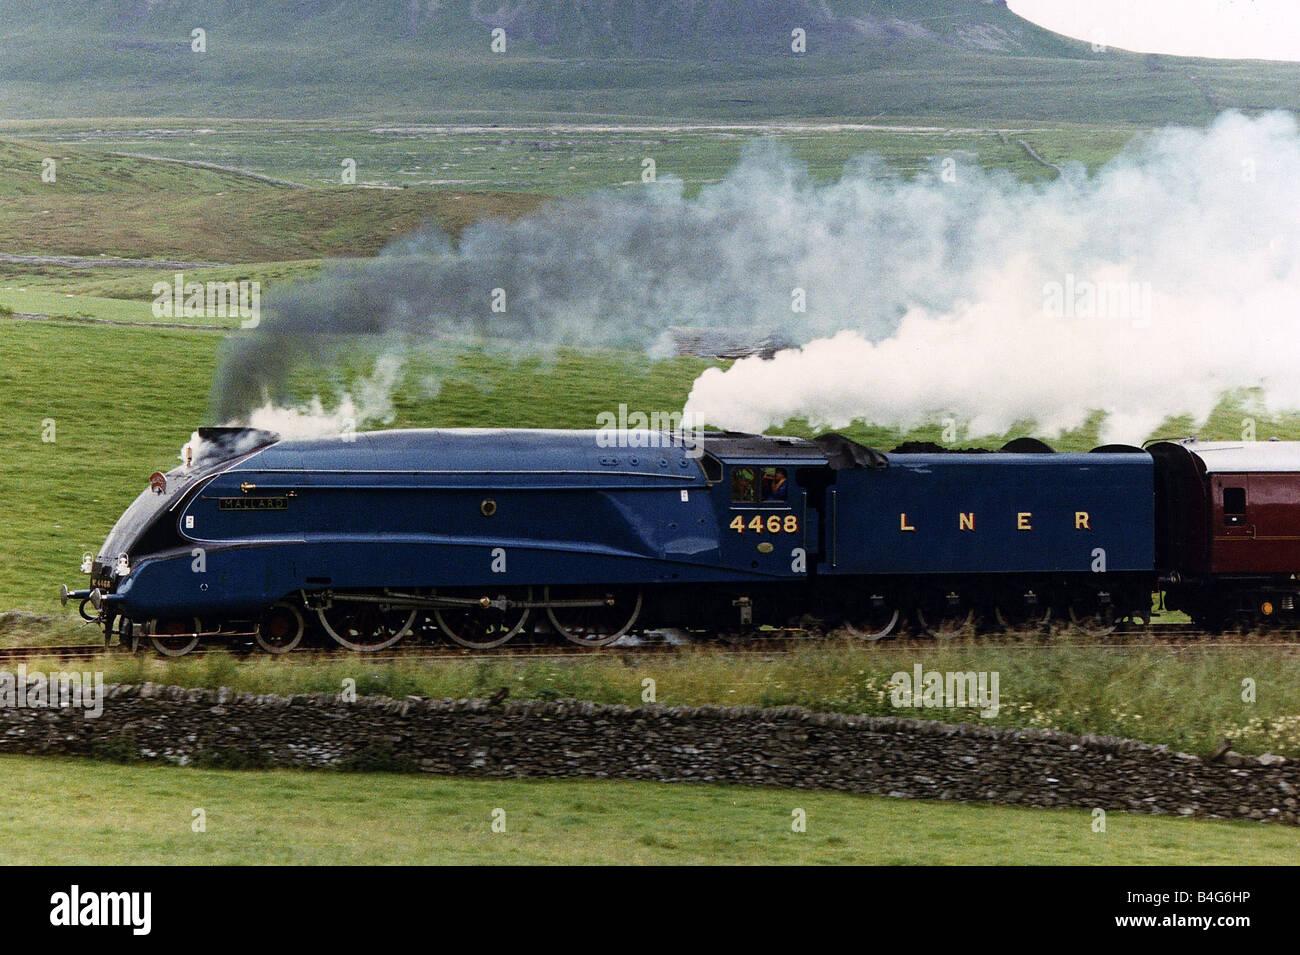 Mallard Steam Engine Train that broke the world record for steam at 126mph - Stock Image